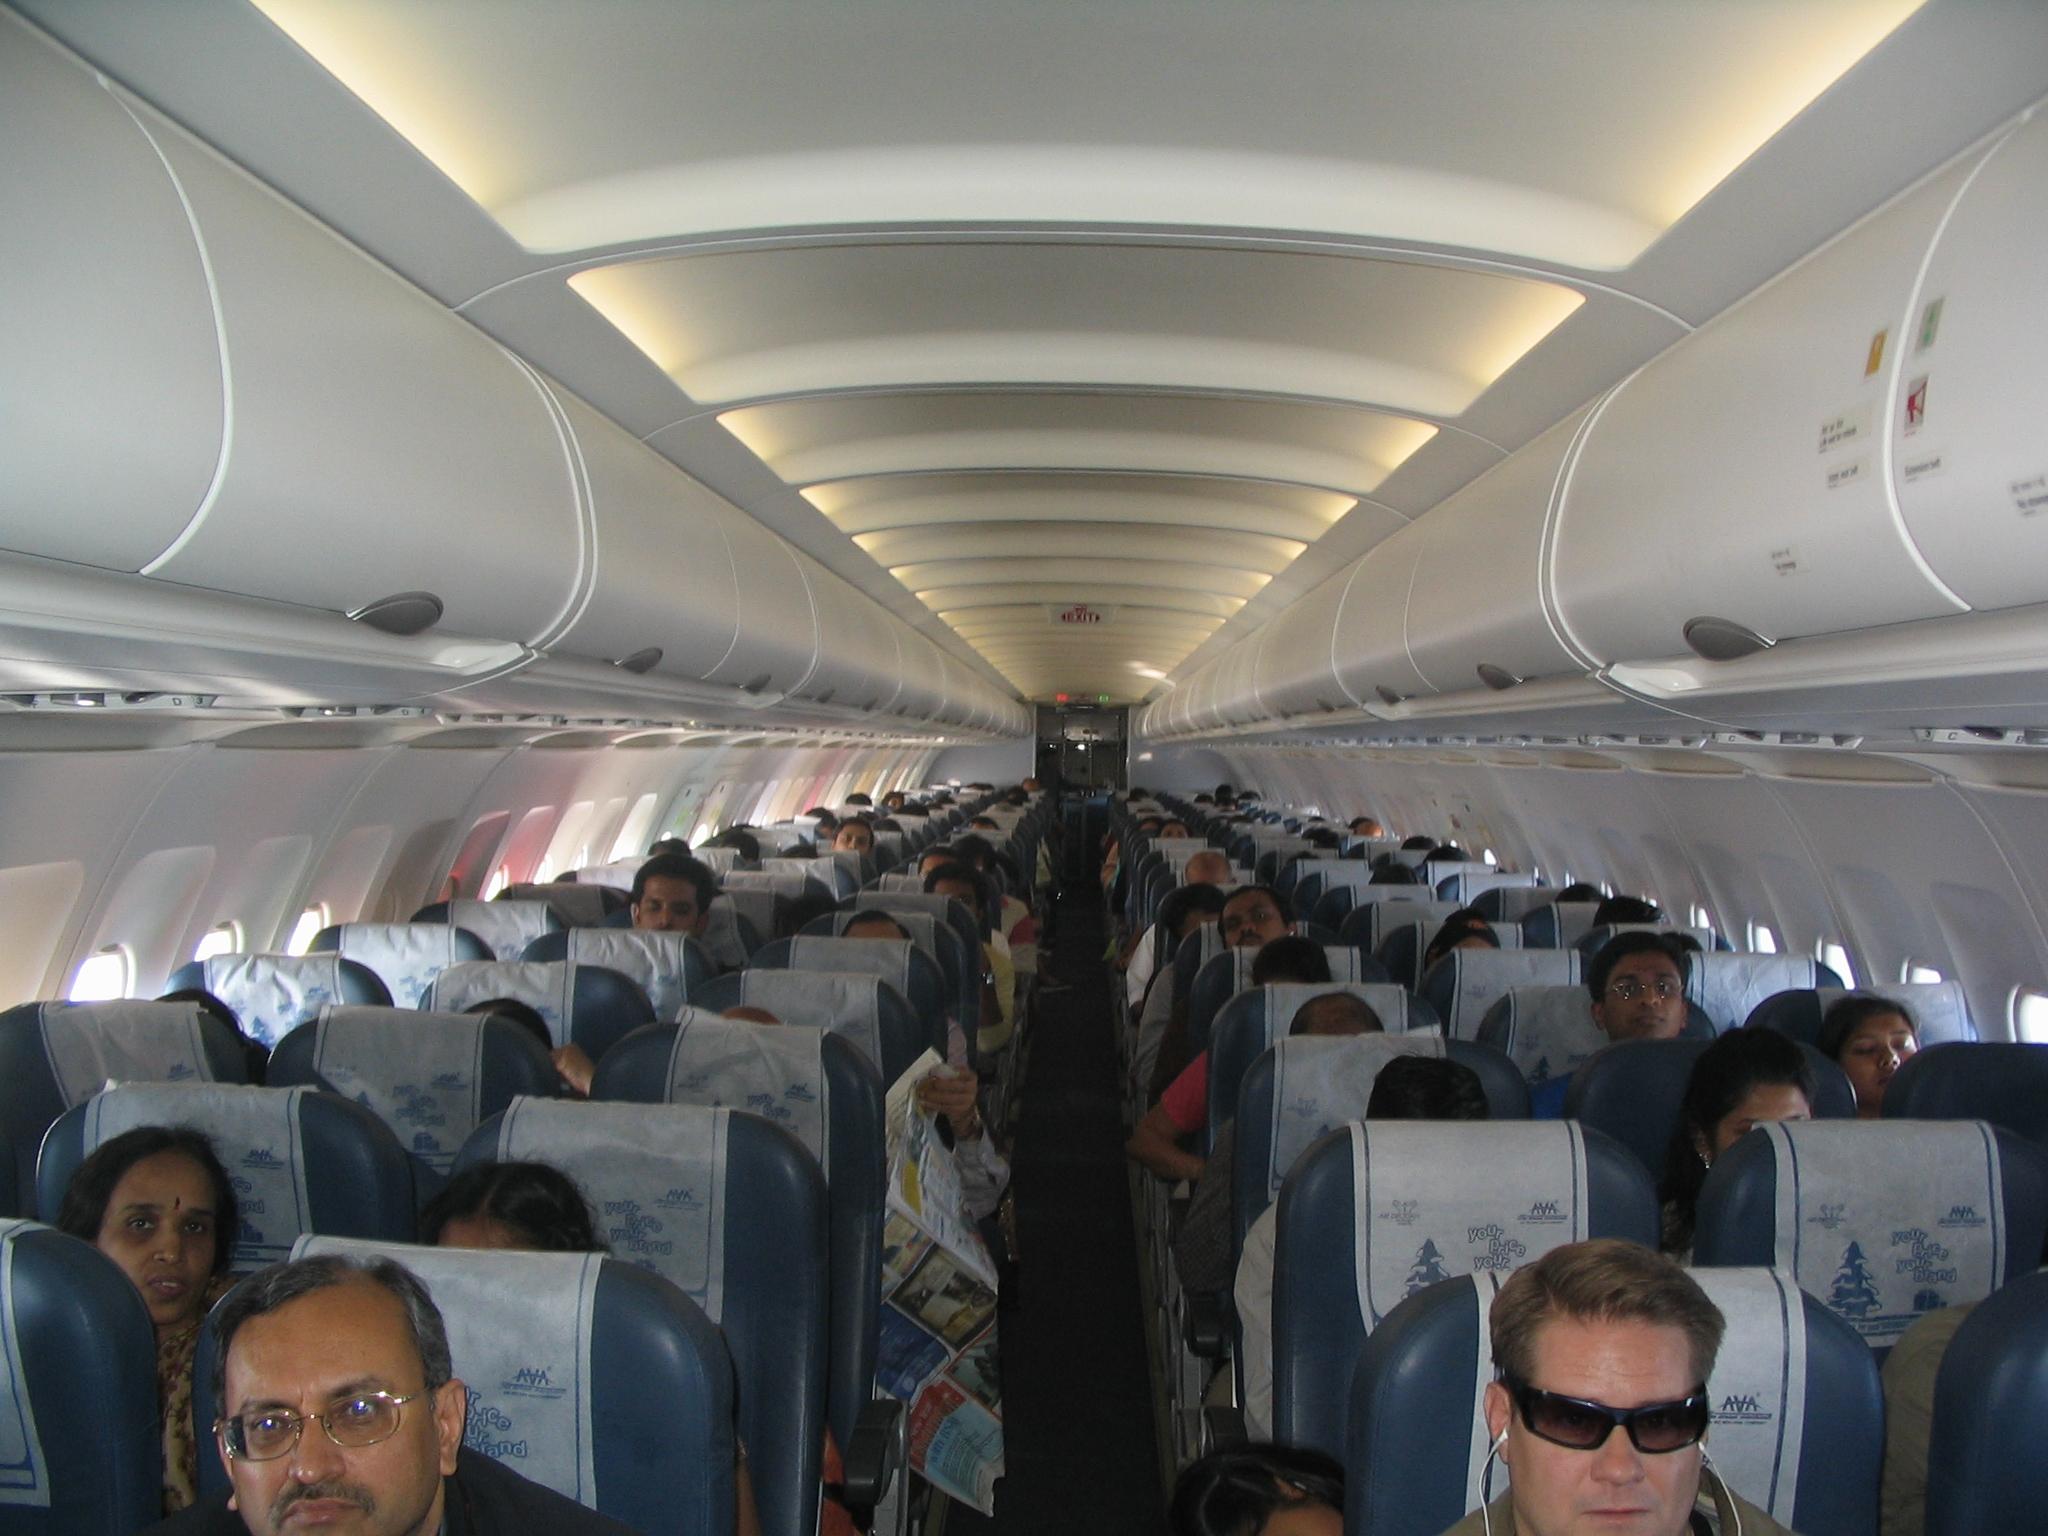 File:Interior of Air Deccan Airbus A320.JPG - Wikimedia Commons: commons.wikimedia.org/wiki/File:Interior_of_Air_Deccan_Airbus_A320.JPG